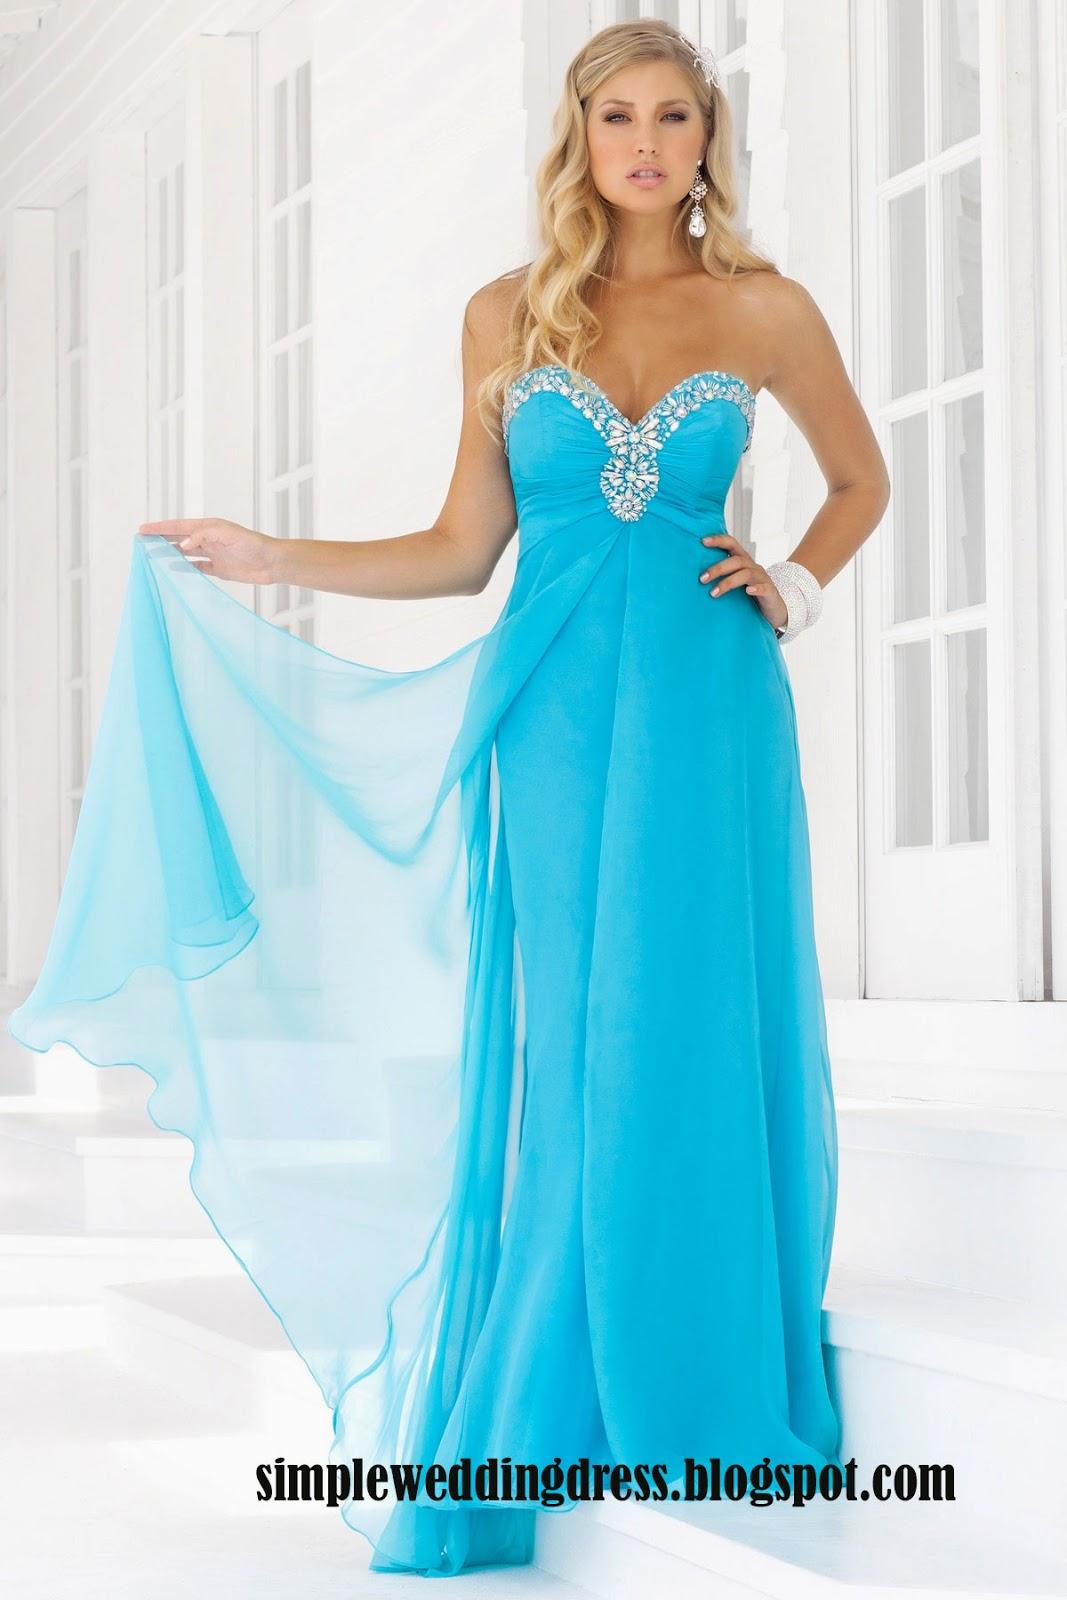 Buy Cheap Prom Dresses - Ocodea.com